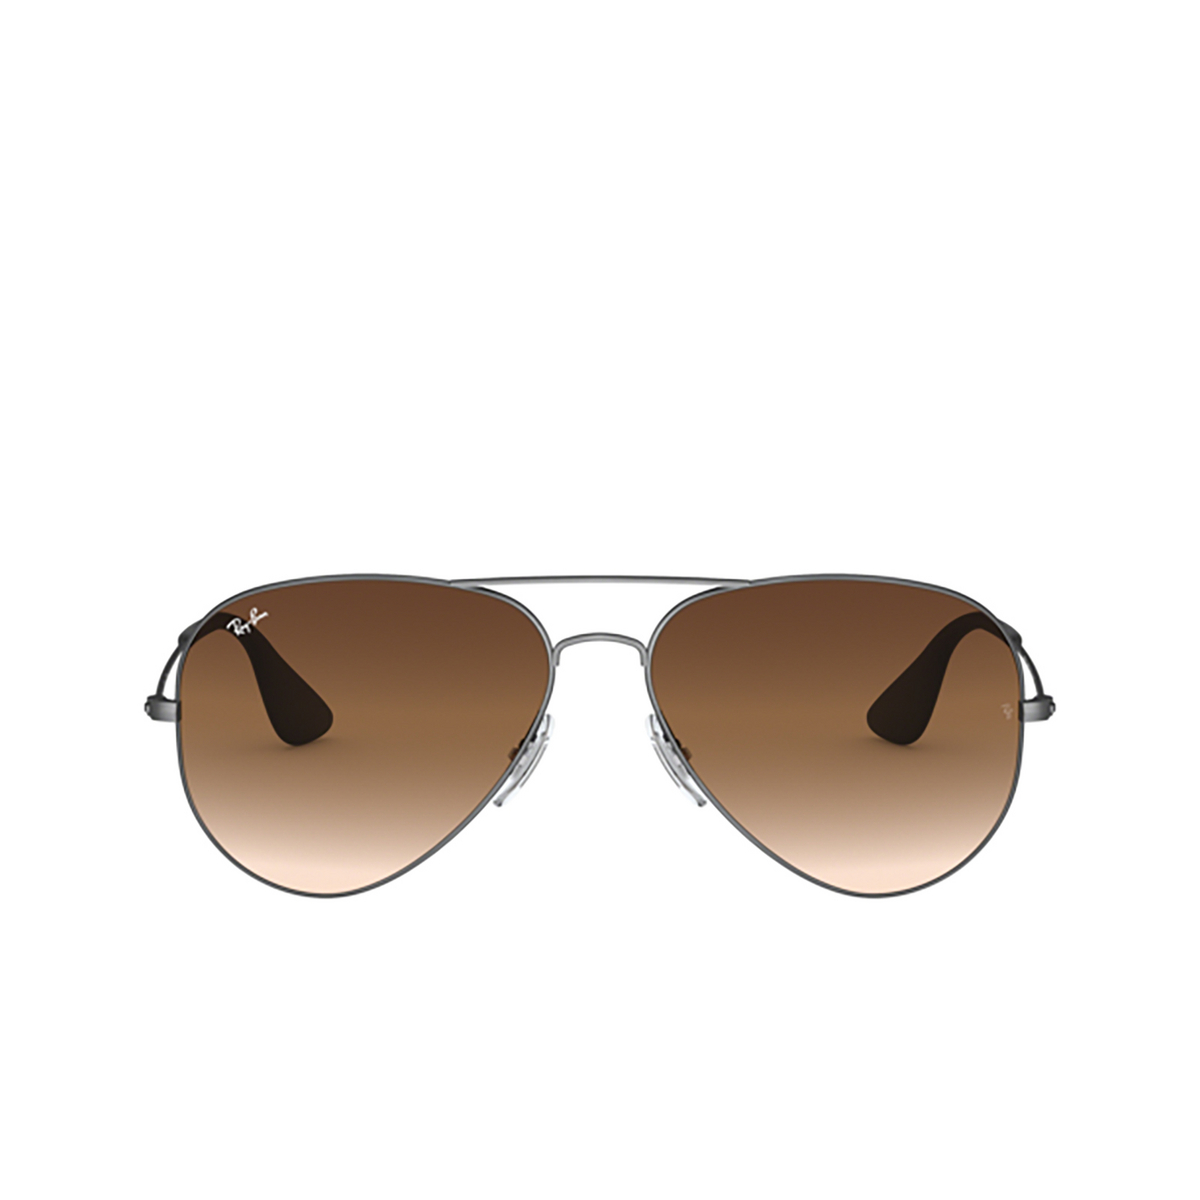 Ray-Ban® Aviator Sunglasses: RB3558 color Matte Black Antique 913913 - 1/3.